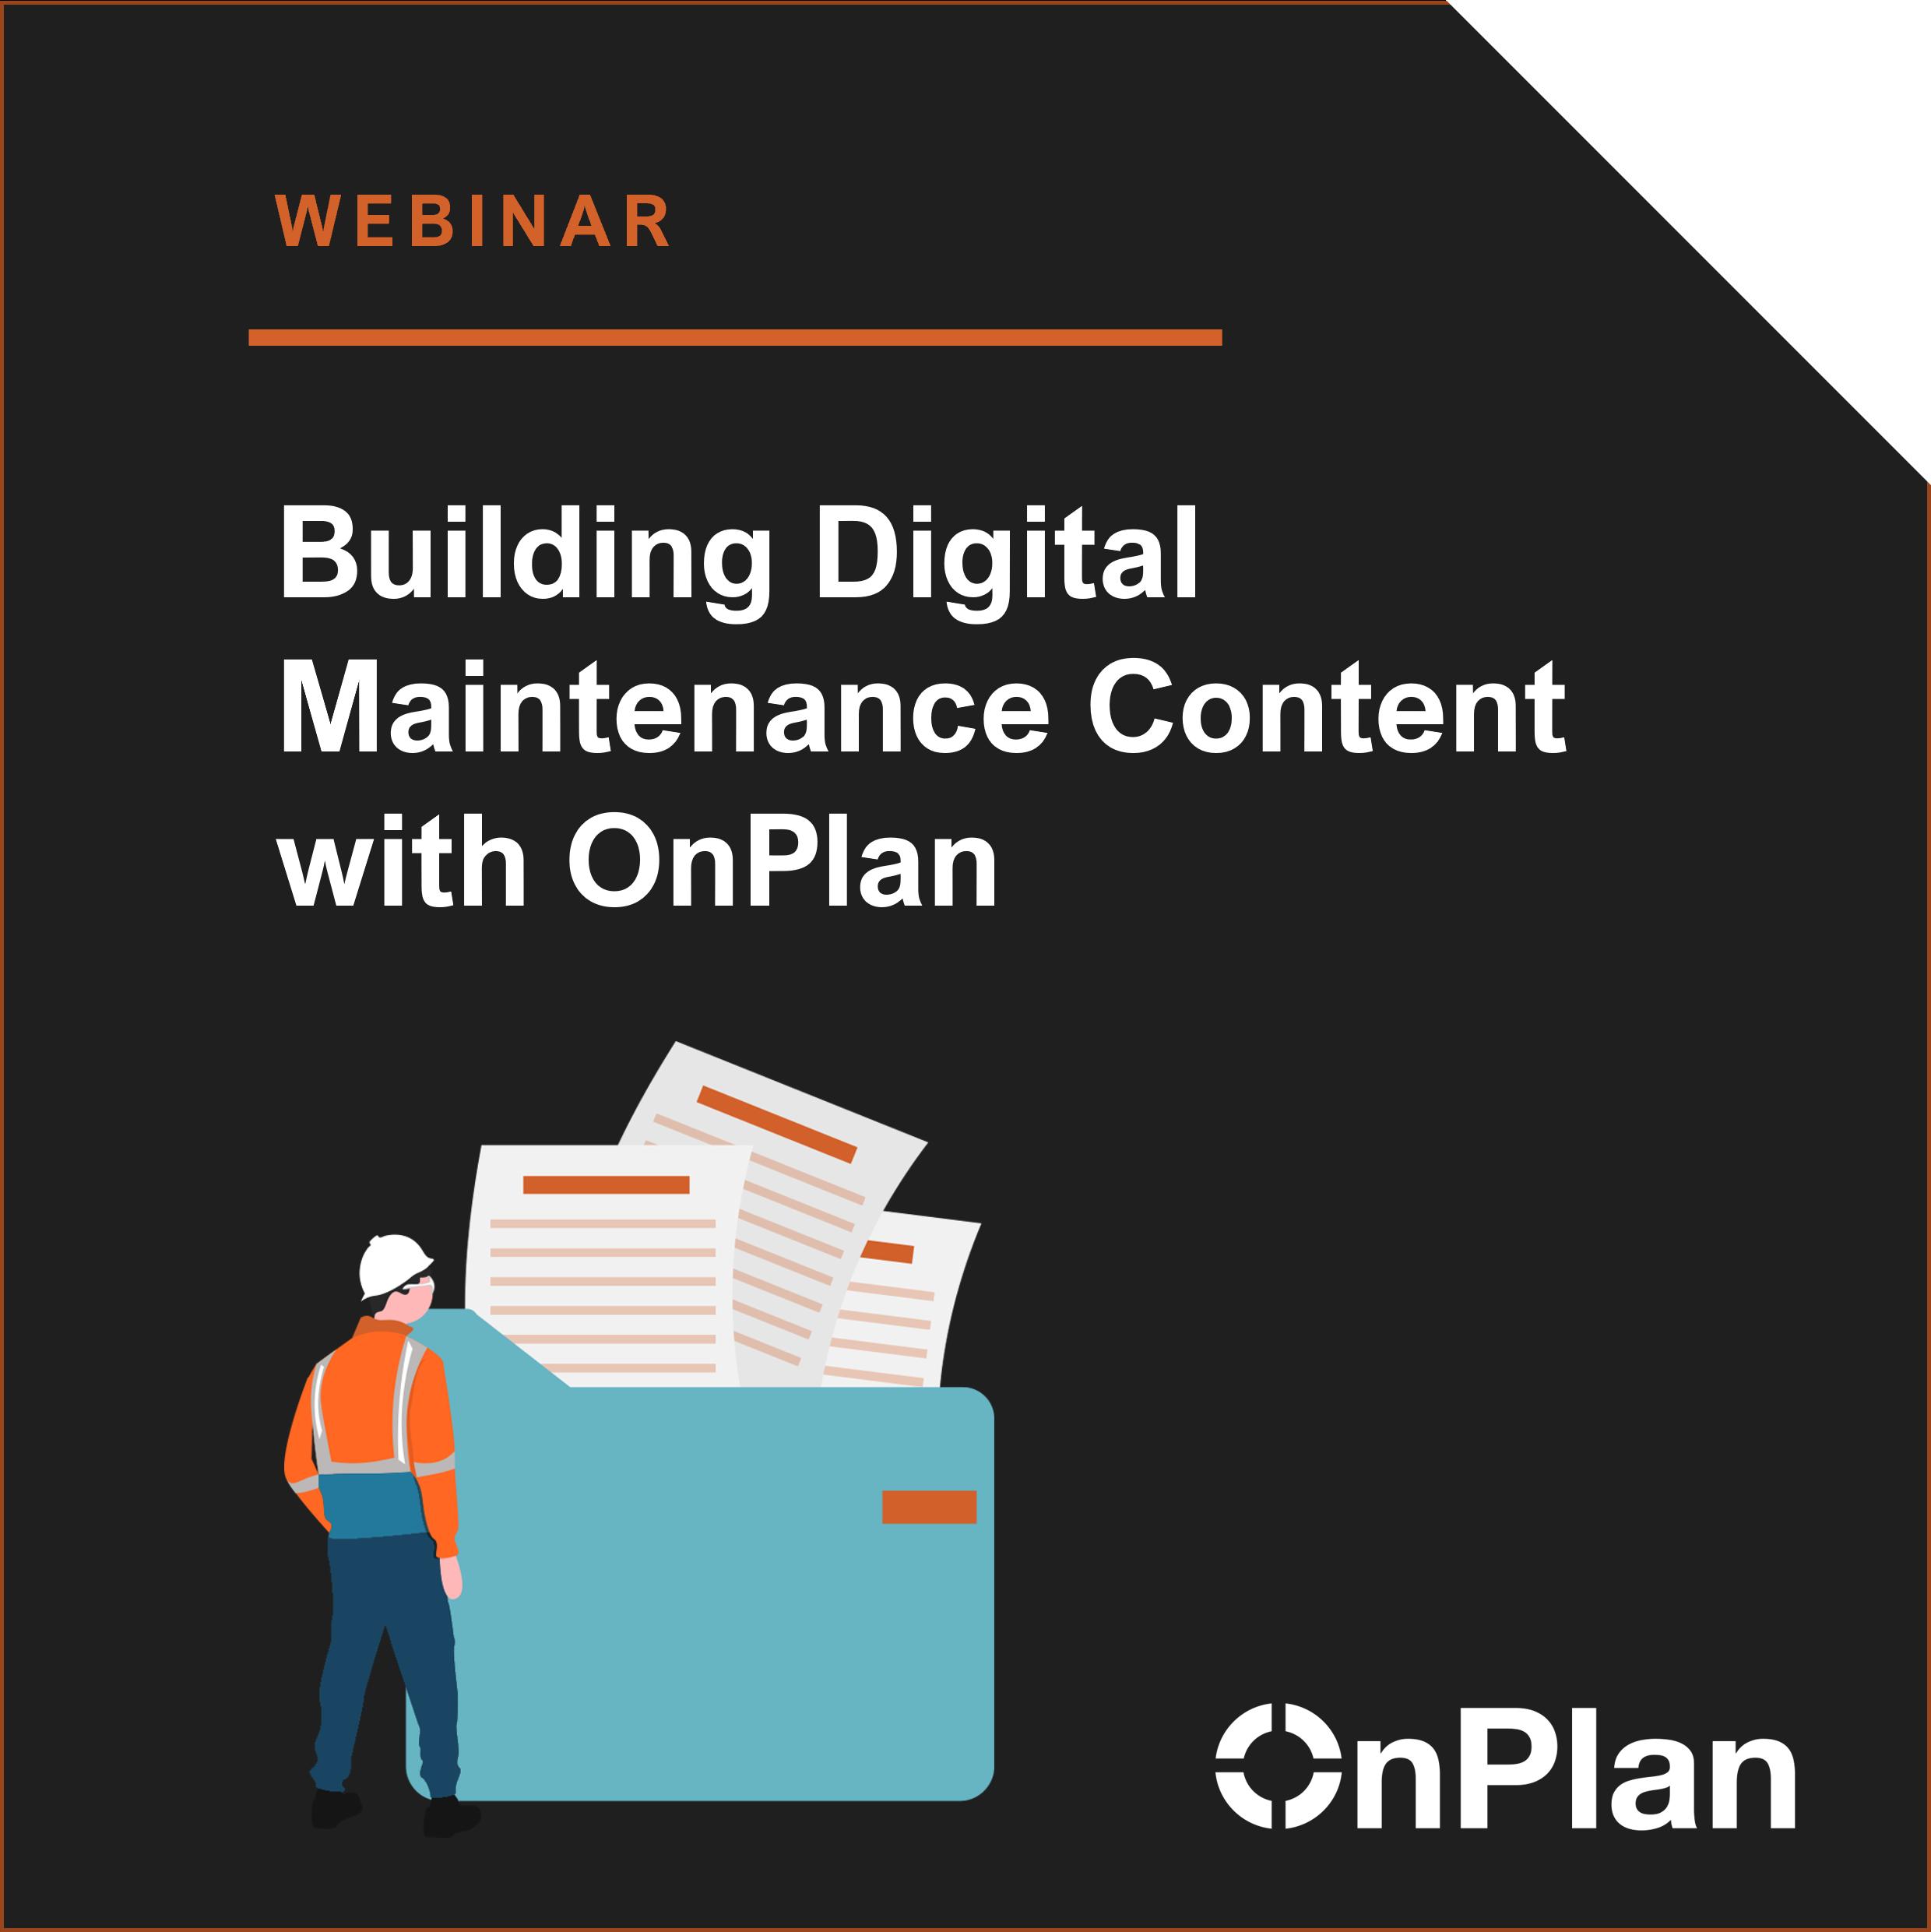 OnPlan digital asset management software overview.